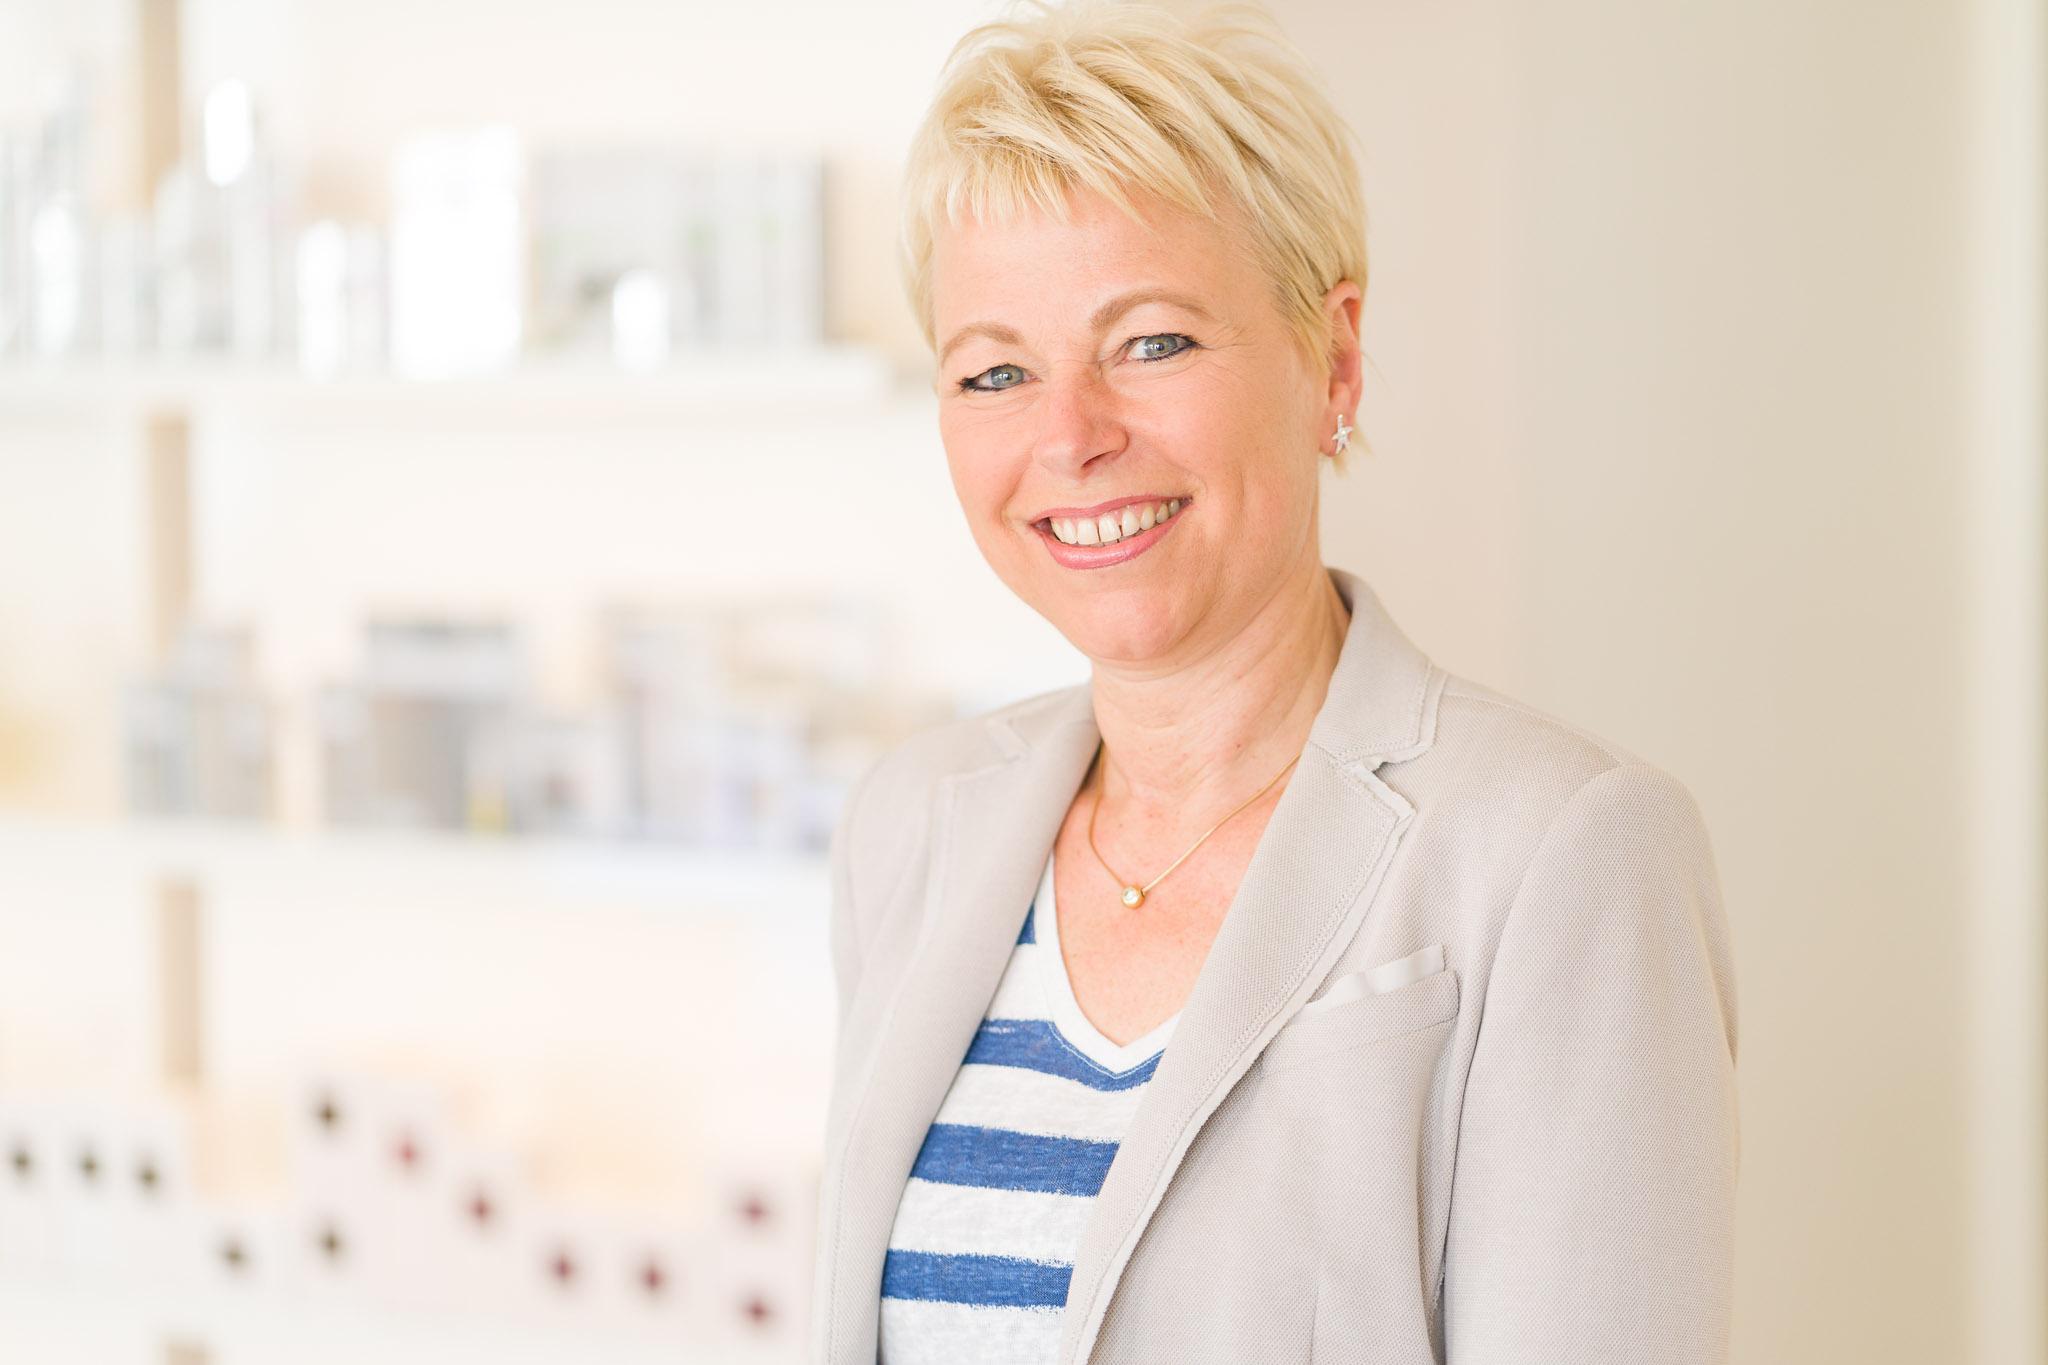 Kosmetikstudio-Buesching-6748-2.jpg – Just in Time Marketing & PR GmbH